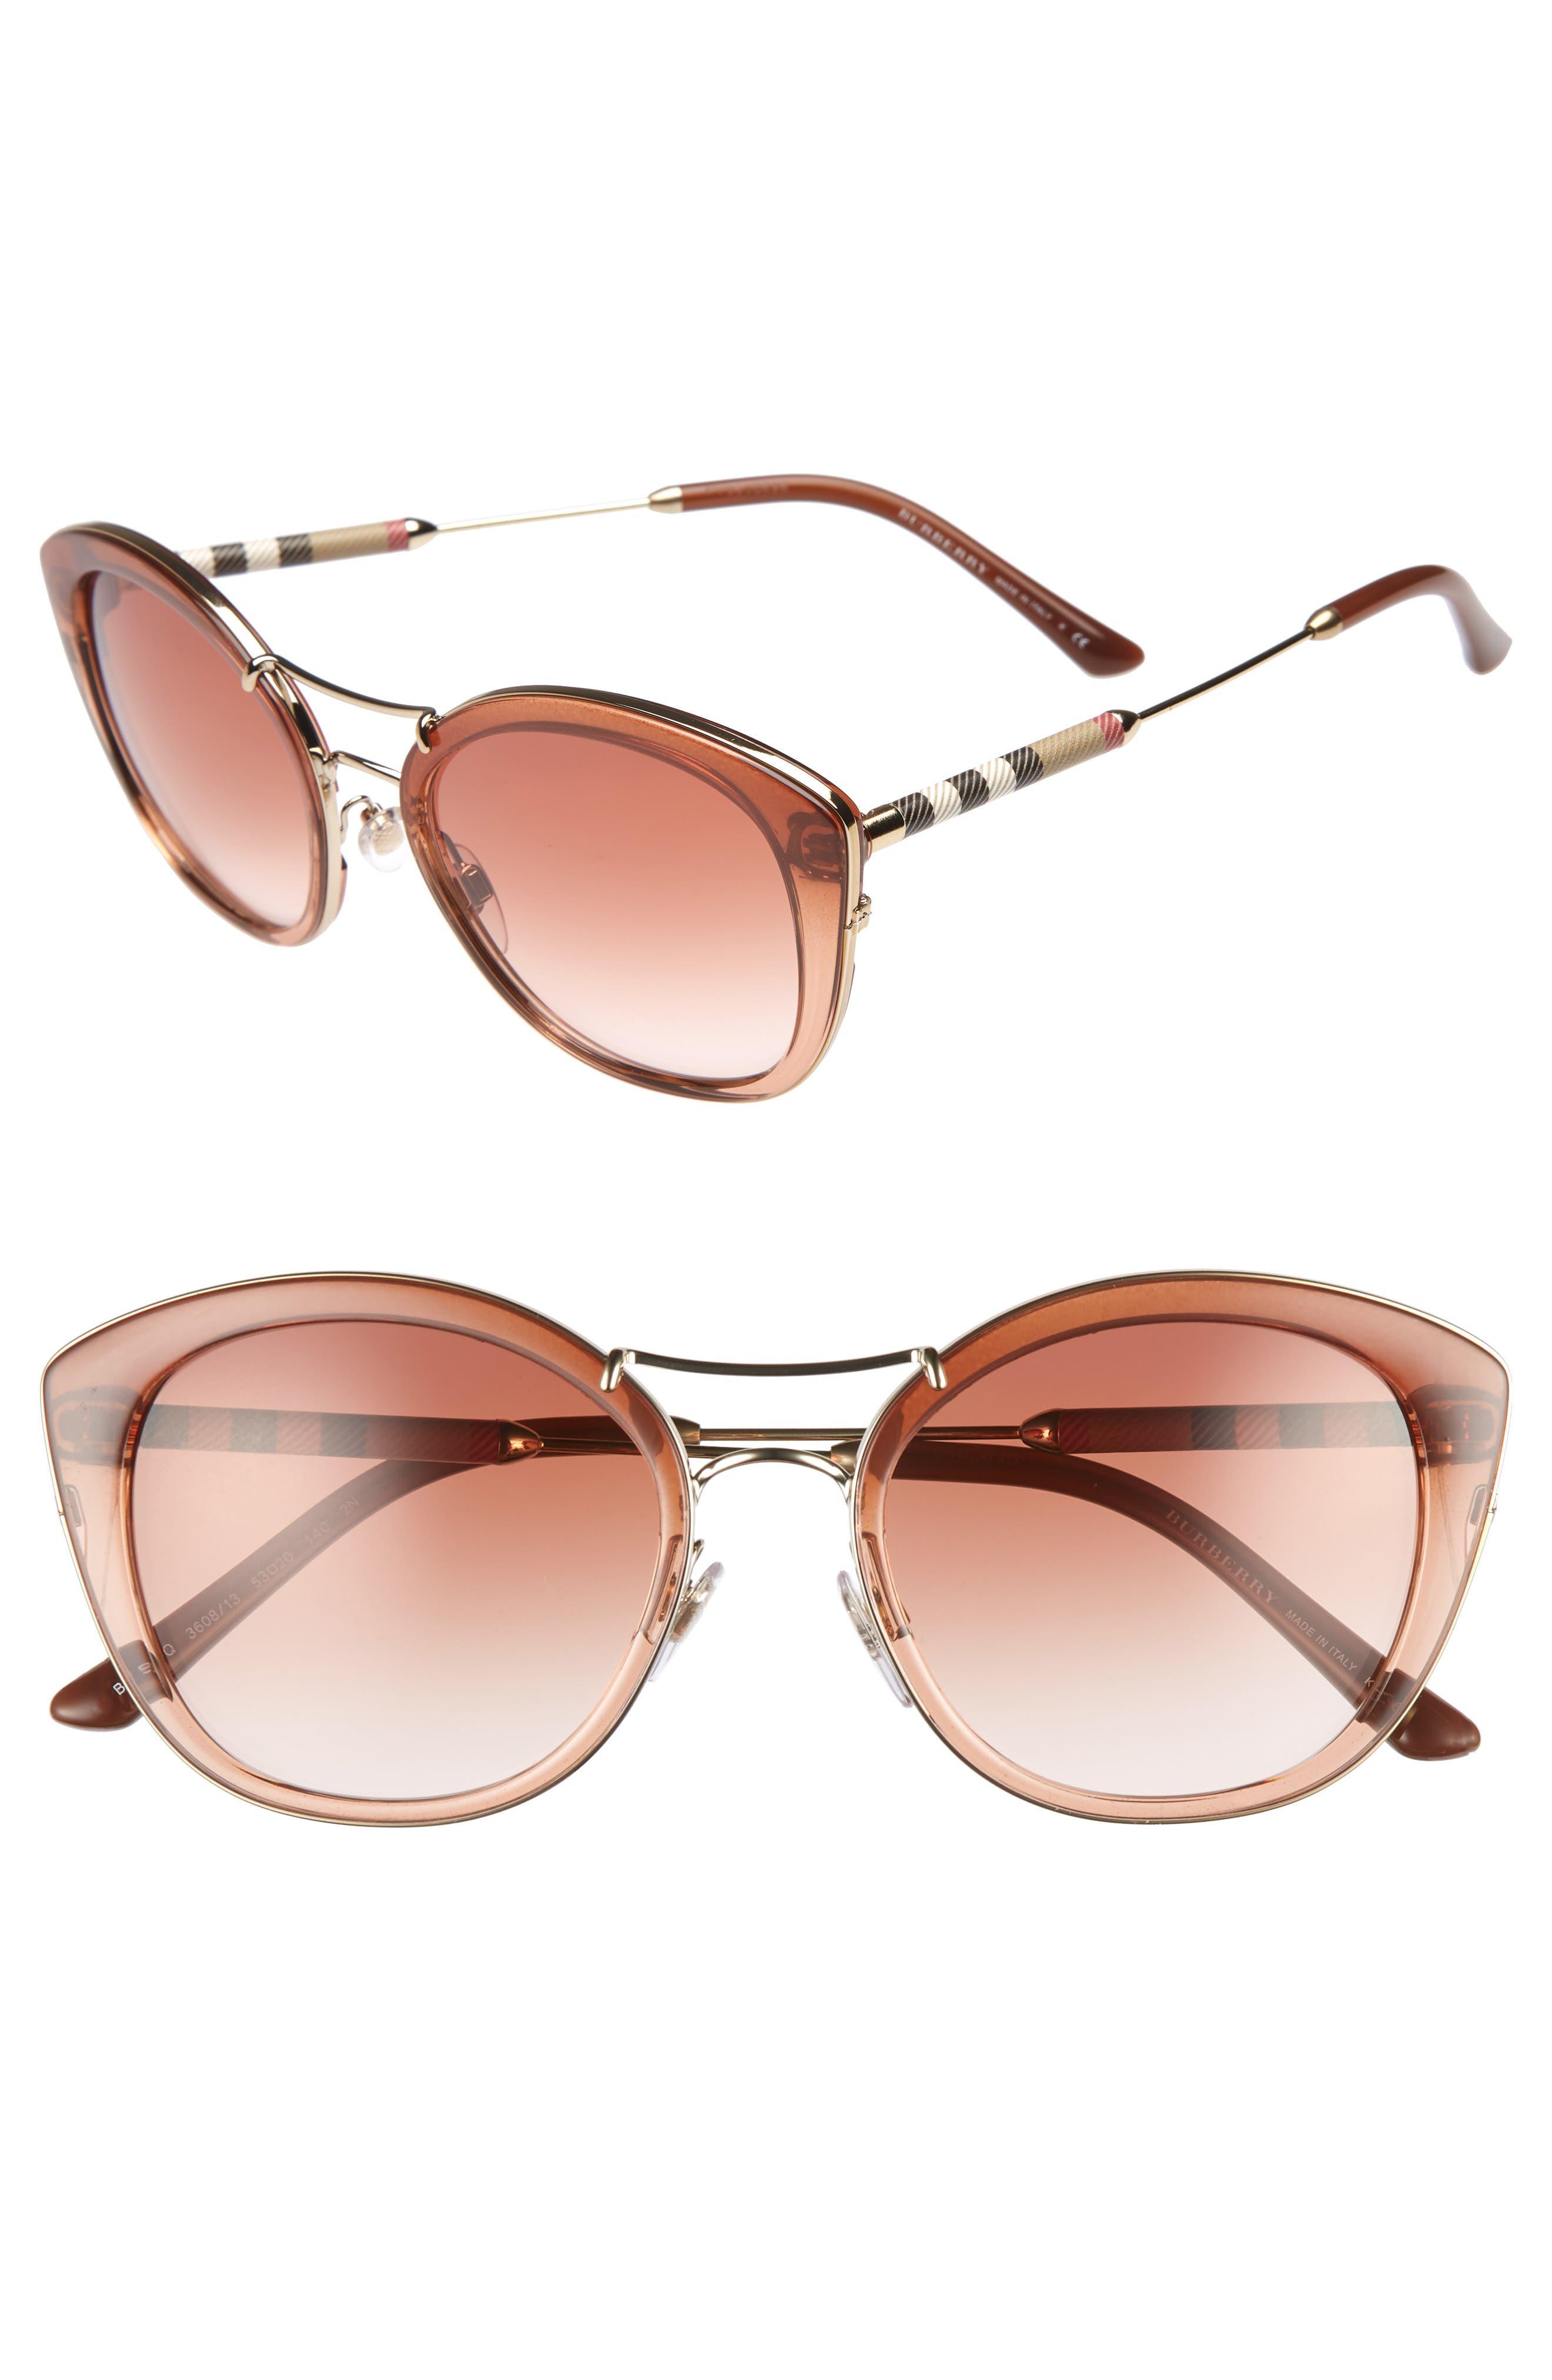 53mm Gradient Sunglasses,                             Main thumbnail 1, color,                             BROWN GRADIENT